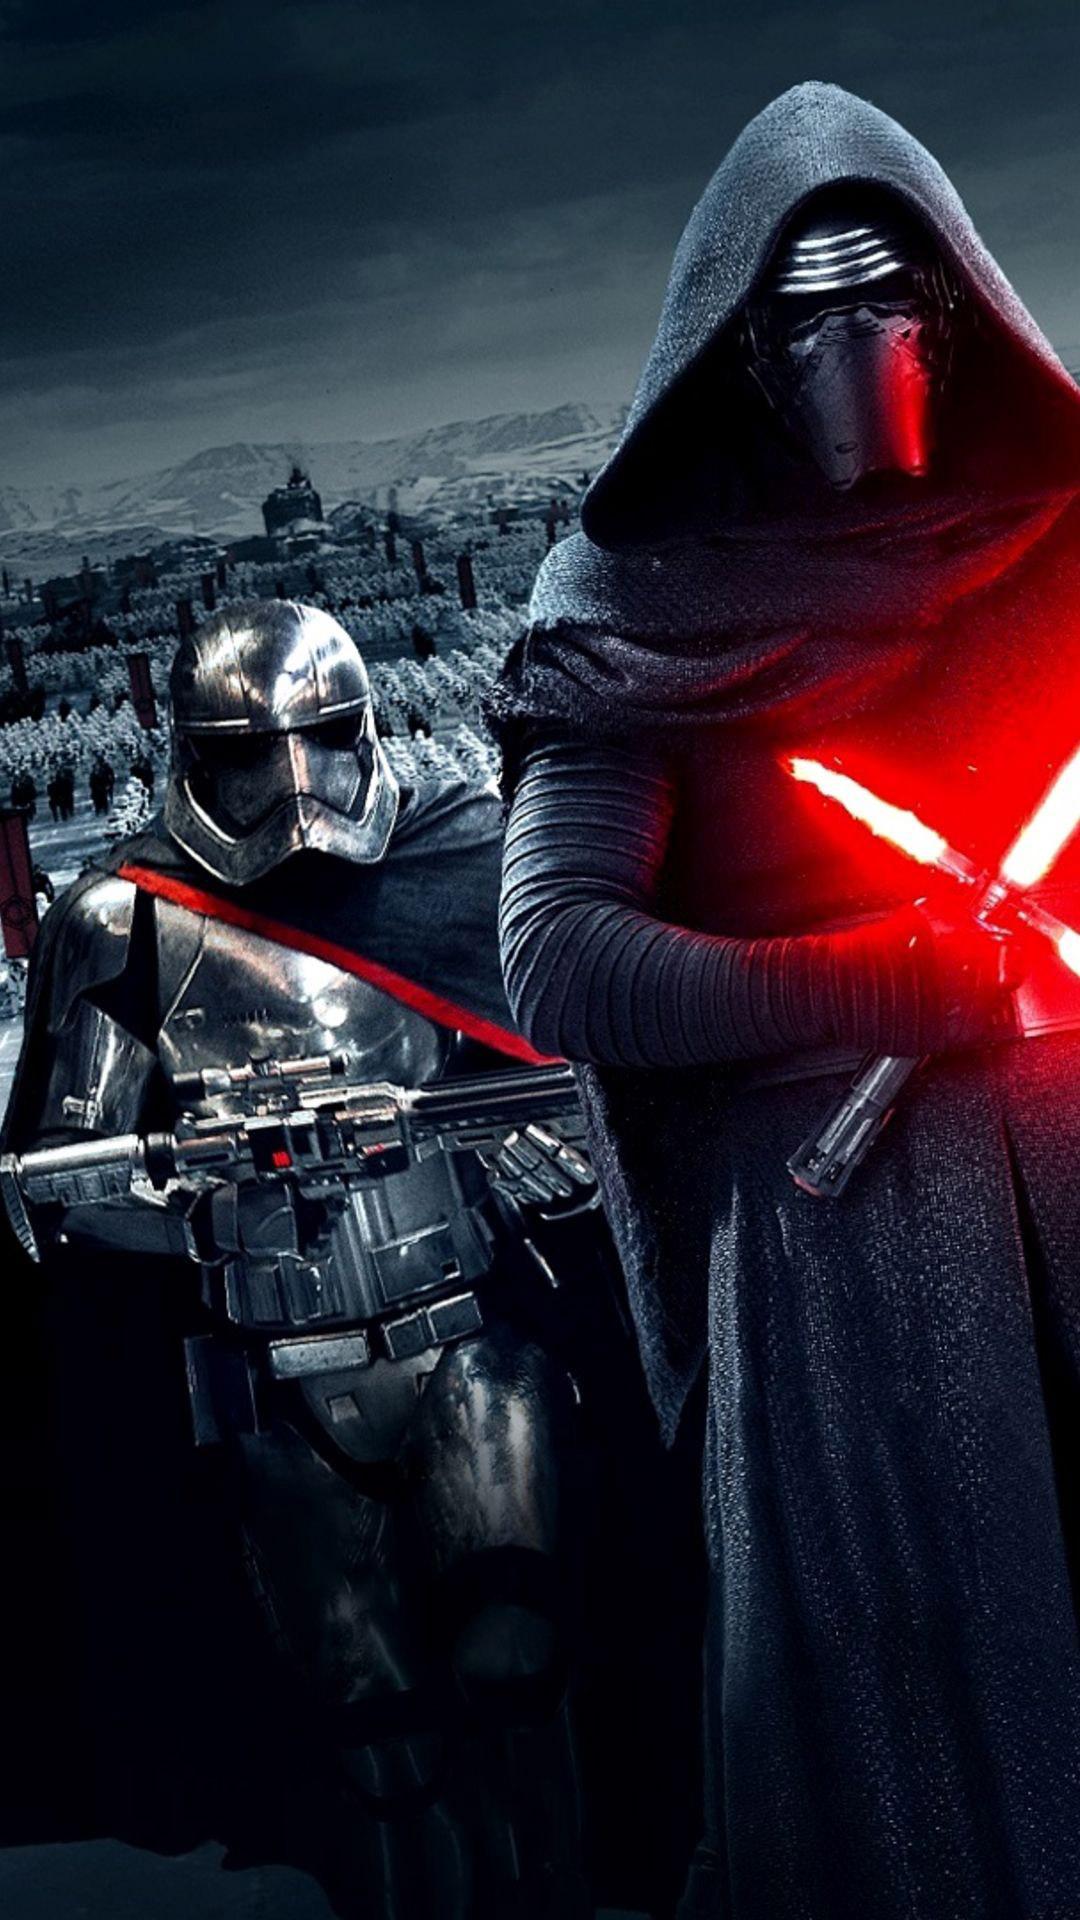 Star-Wars-The-Force-Awakens-Wallpaper-Kylo-Ren-Captain-Phasma